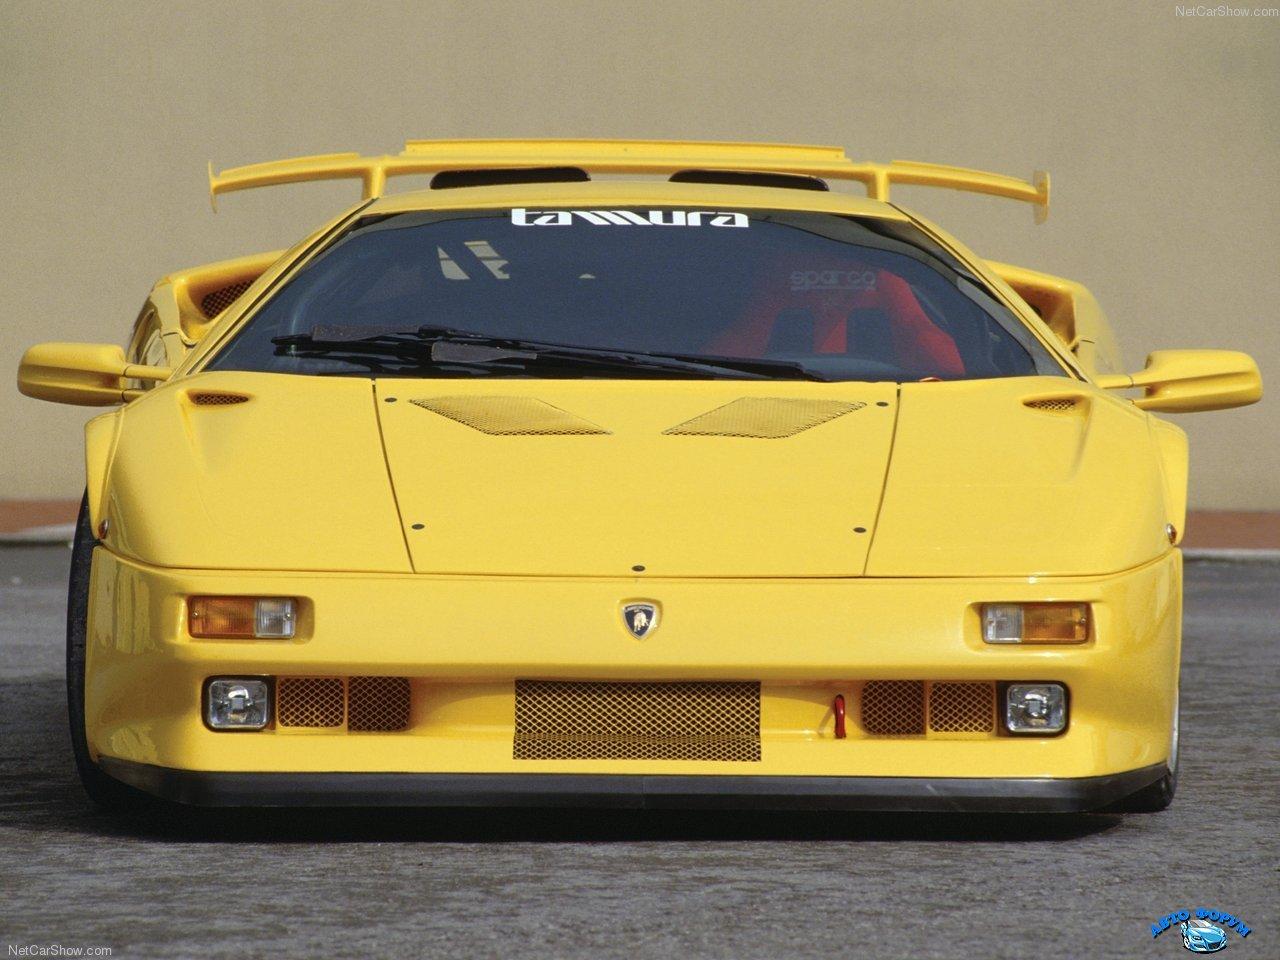 Lamborghini-Diablo_Iota_1995_1280x960_wallpaper_05.jpg